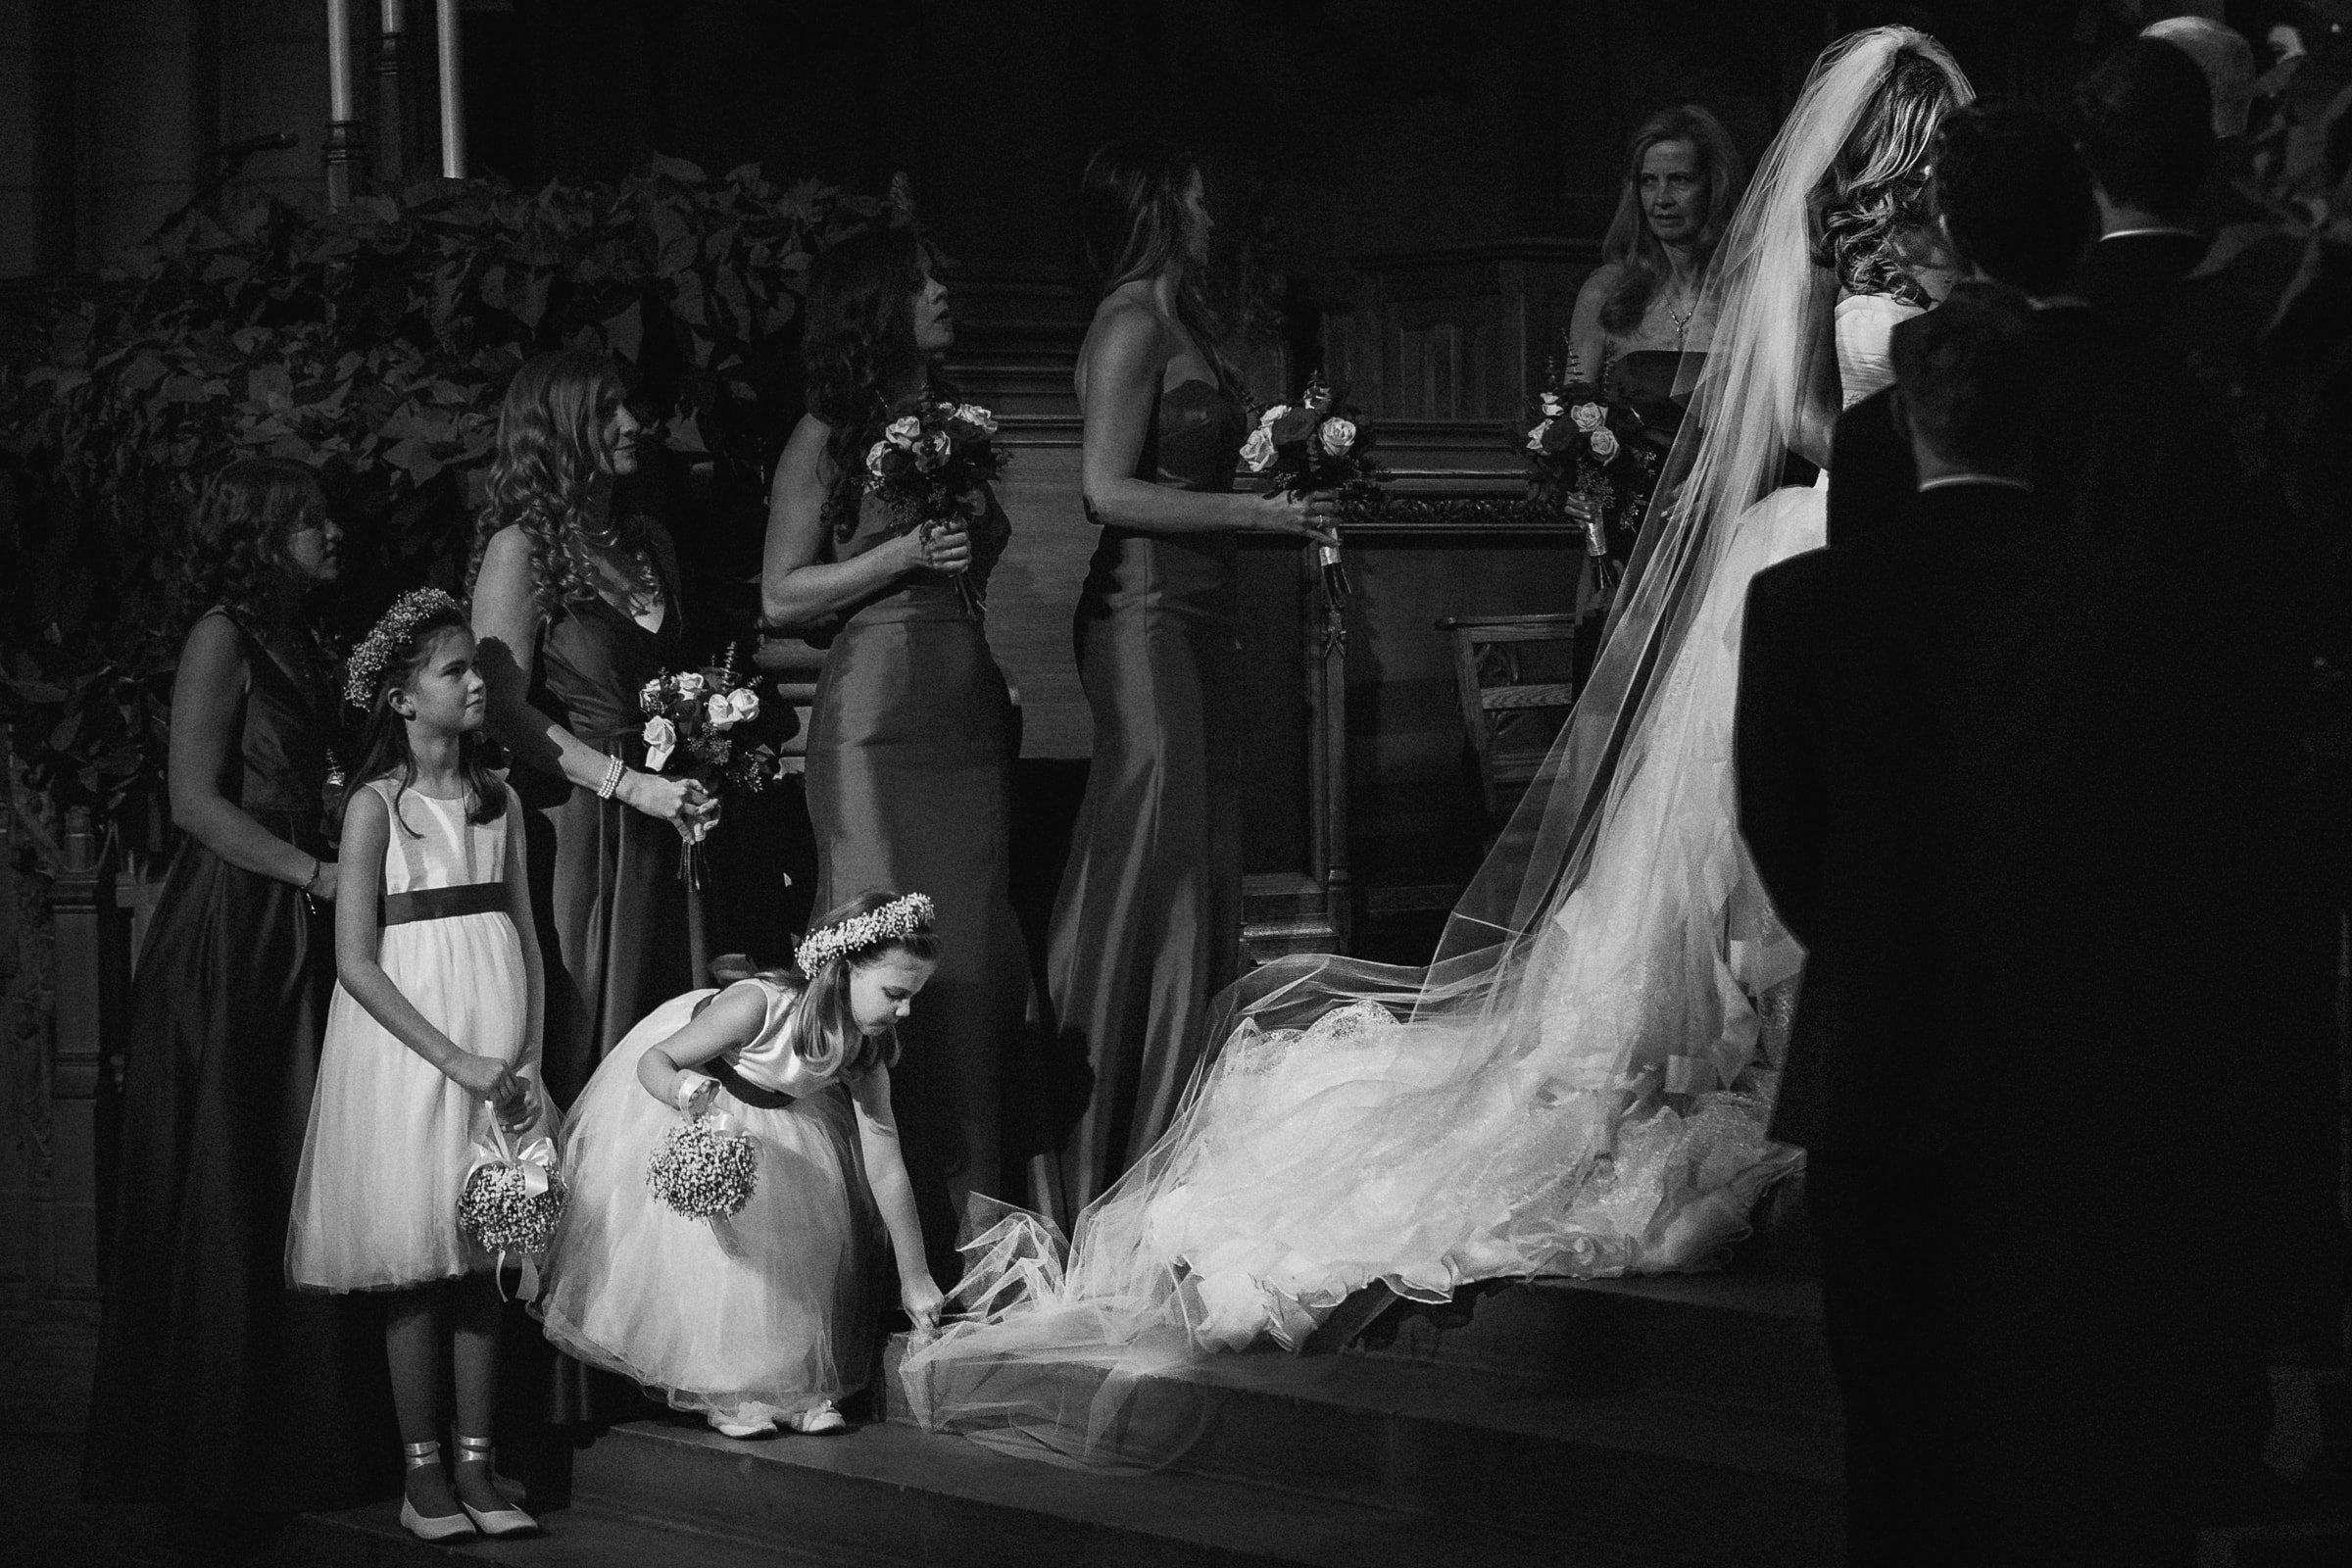 B&W Duke Chapel Wedding Photo by Joe Payne of flower girl fixing dress